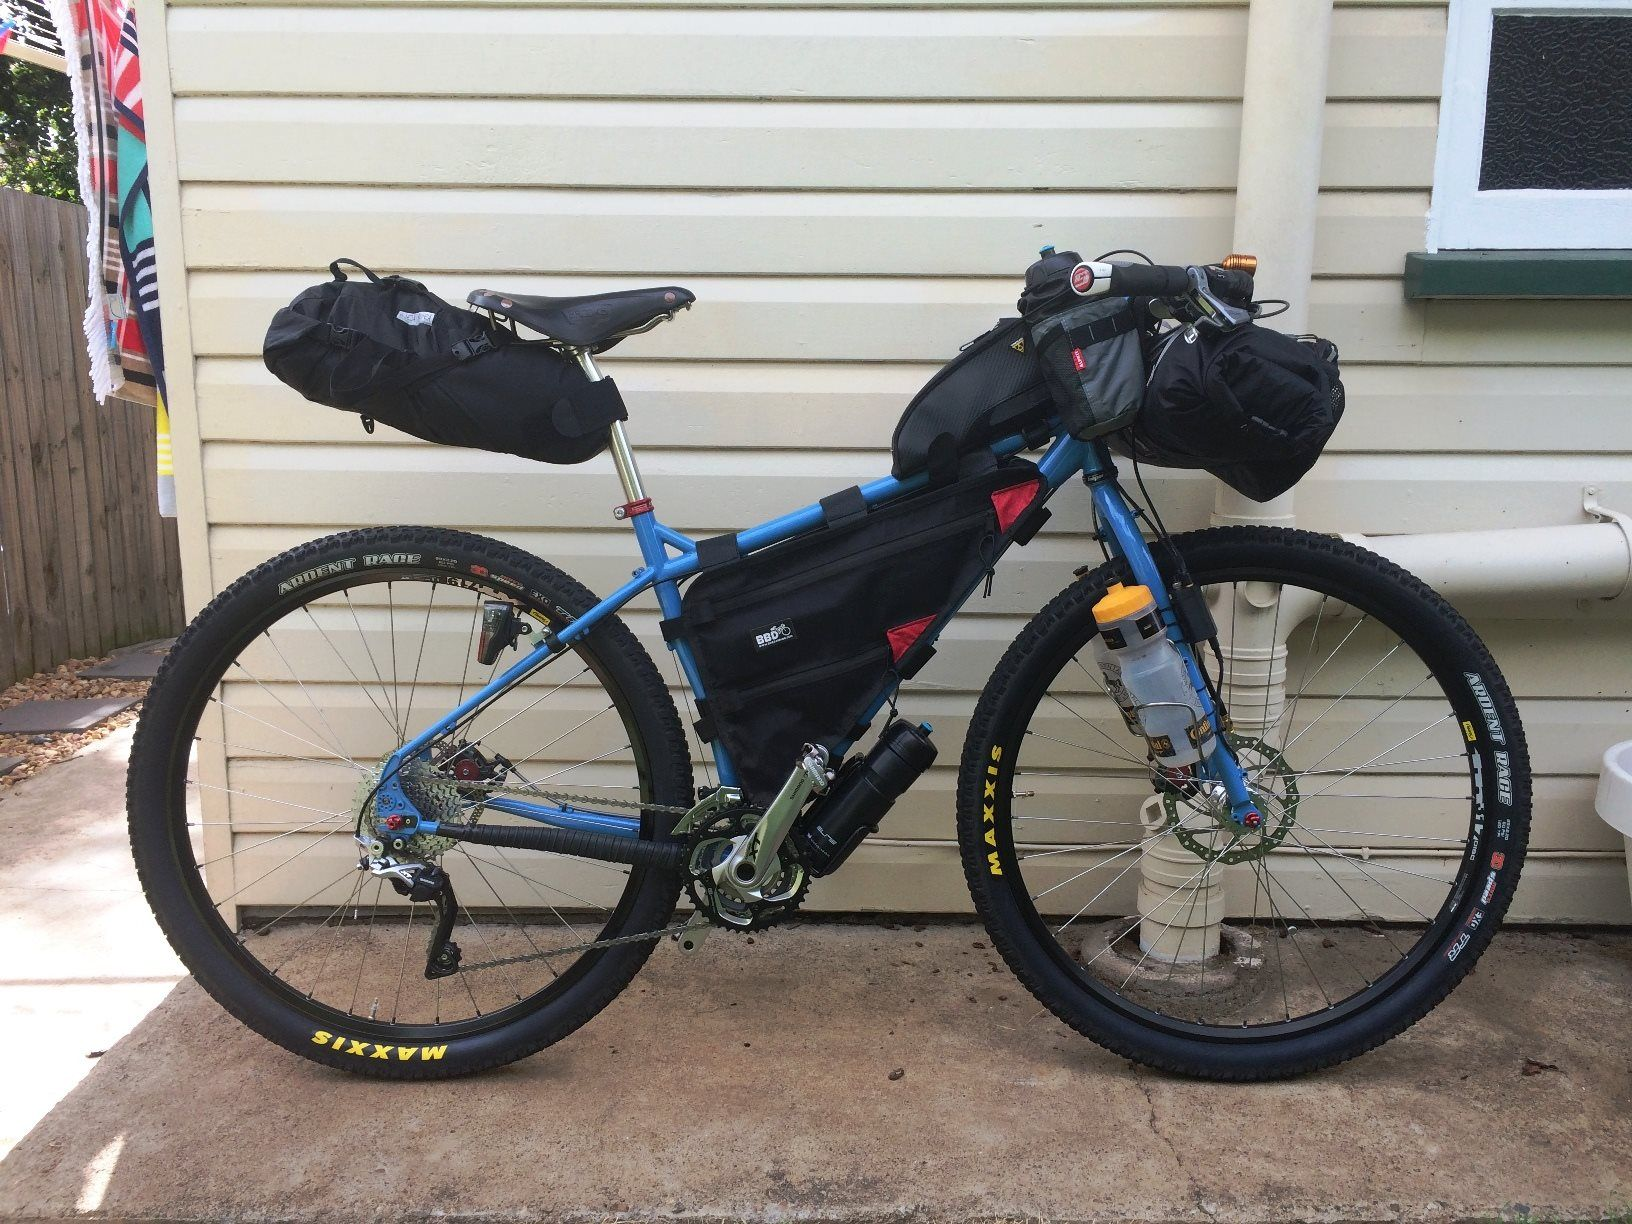 By Stephen Jennings Trek Bikes Bike Camping Touring Bike